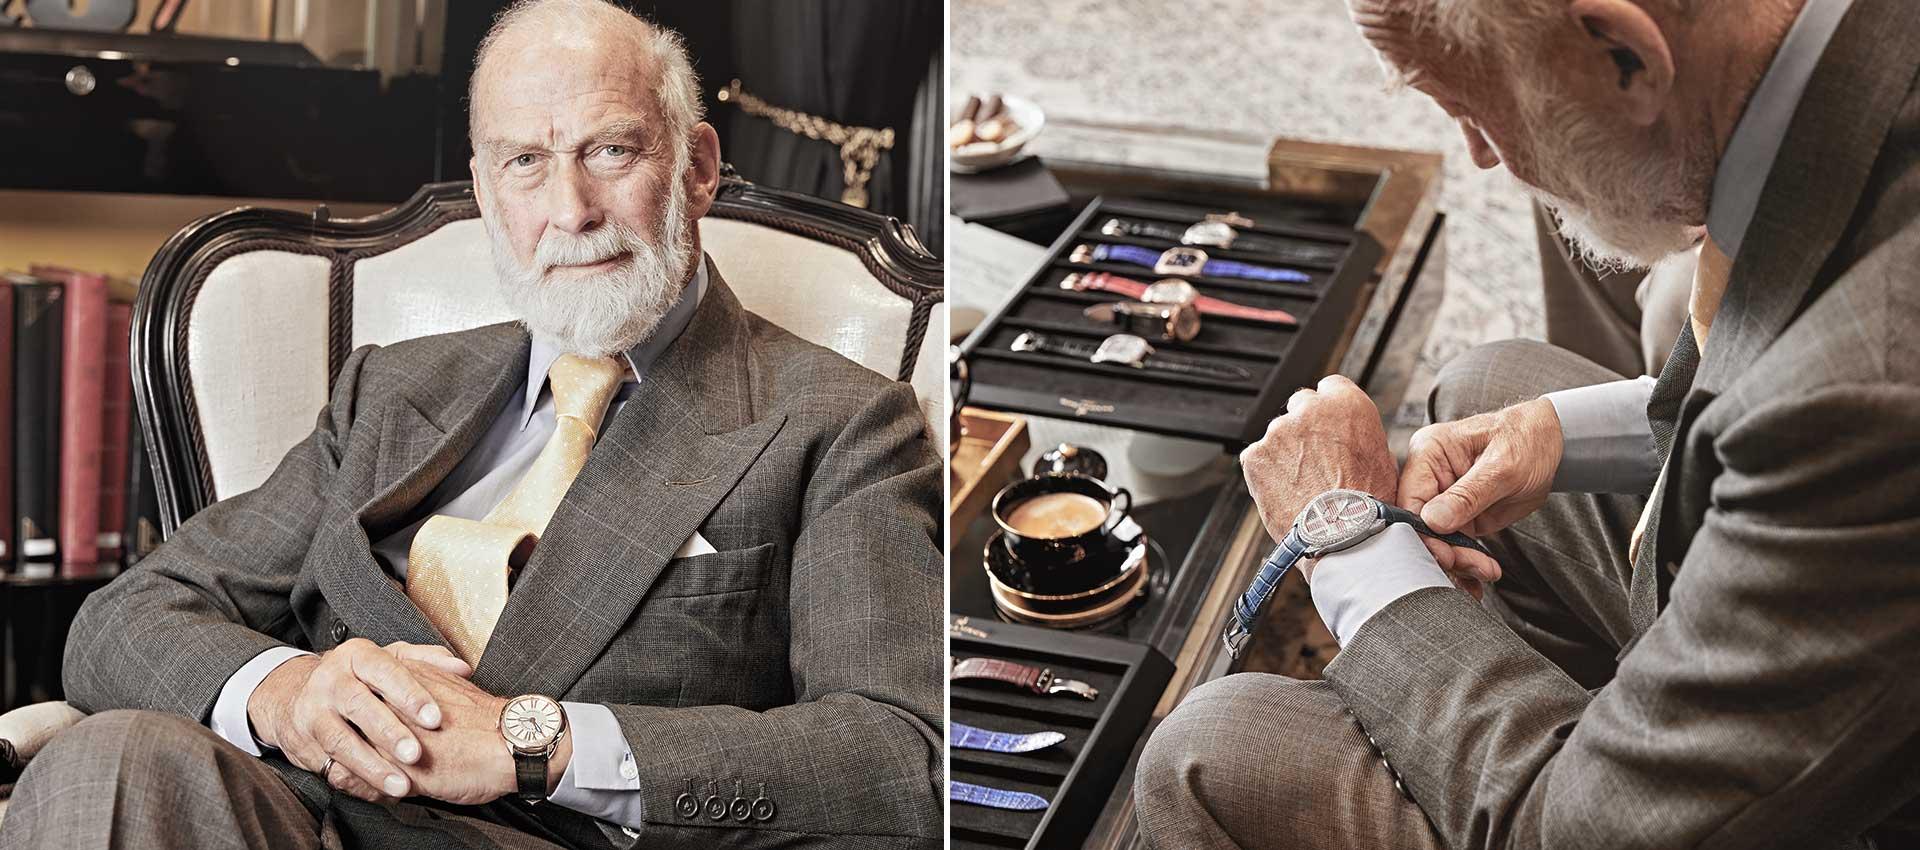 HRH Prince Michael of Kent wearing Backes & Strauss wristwatch